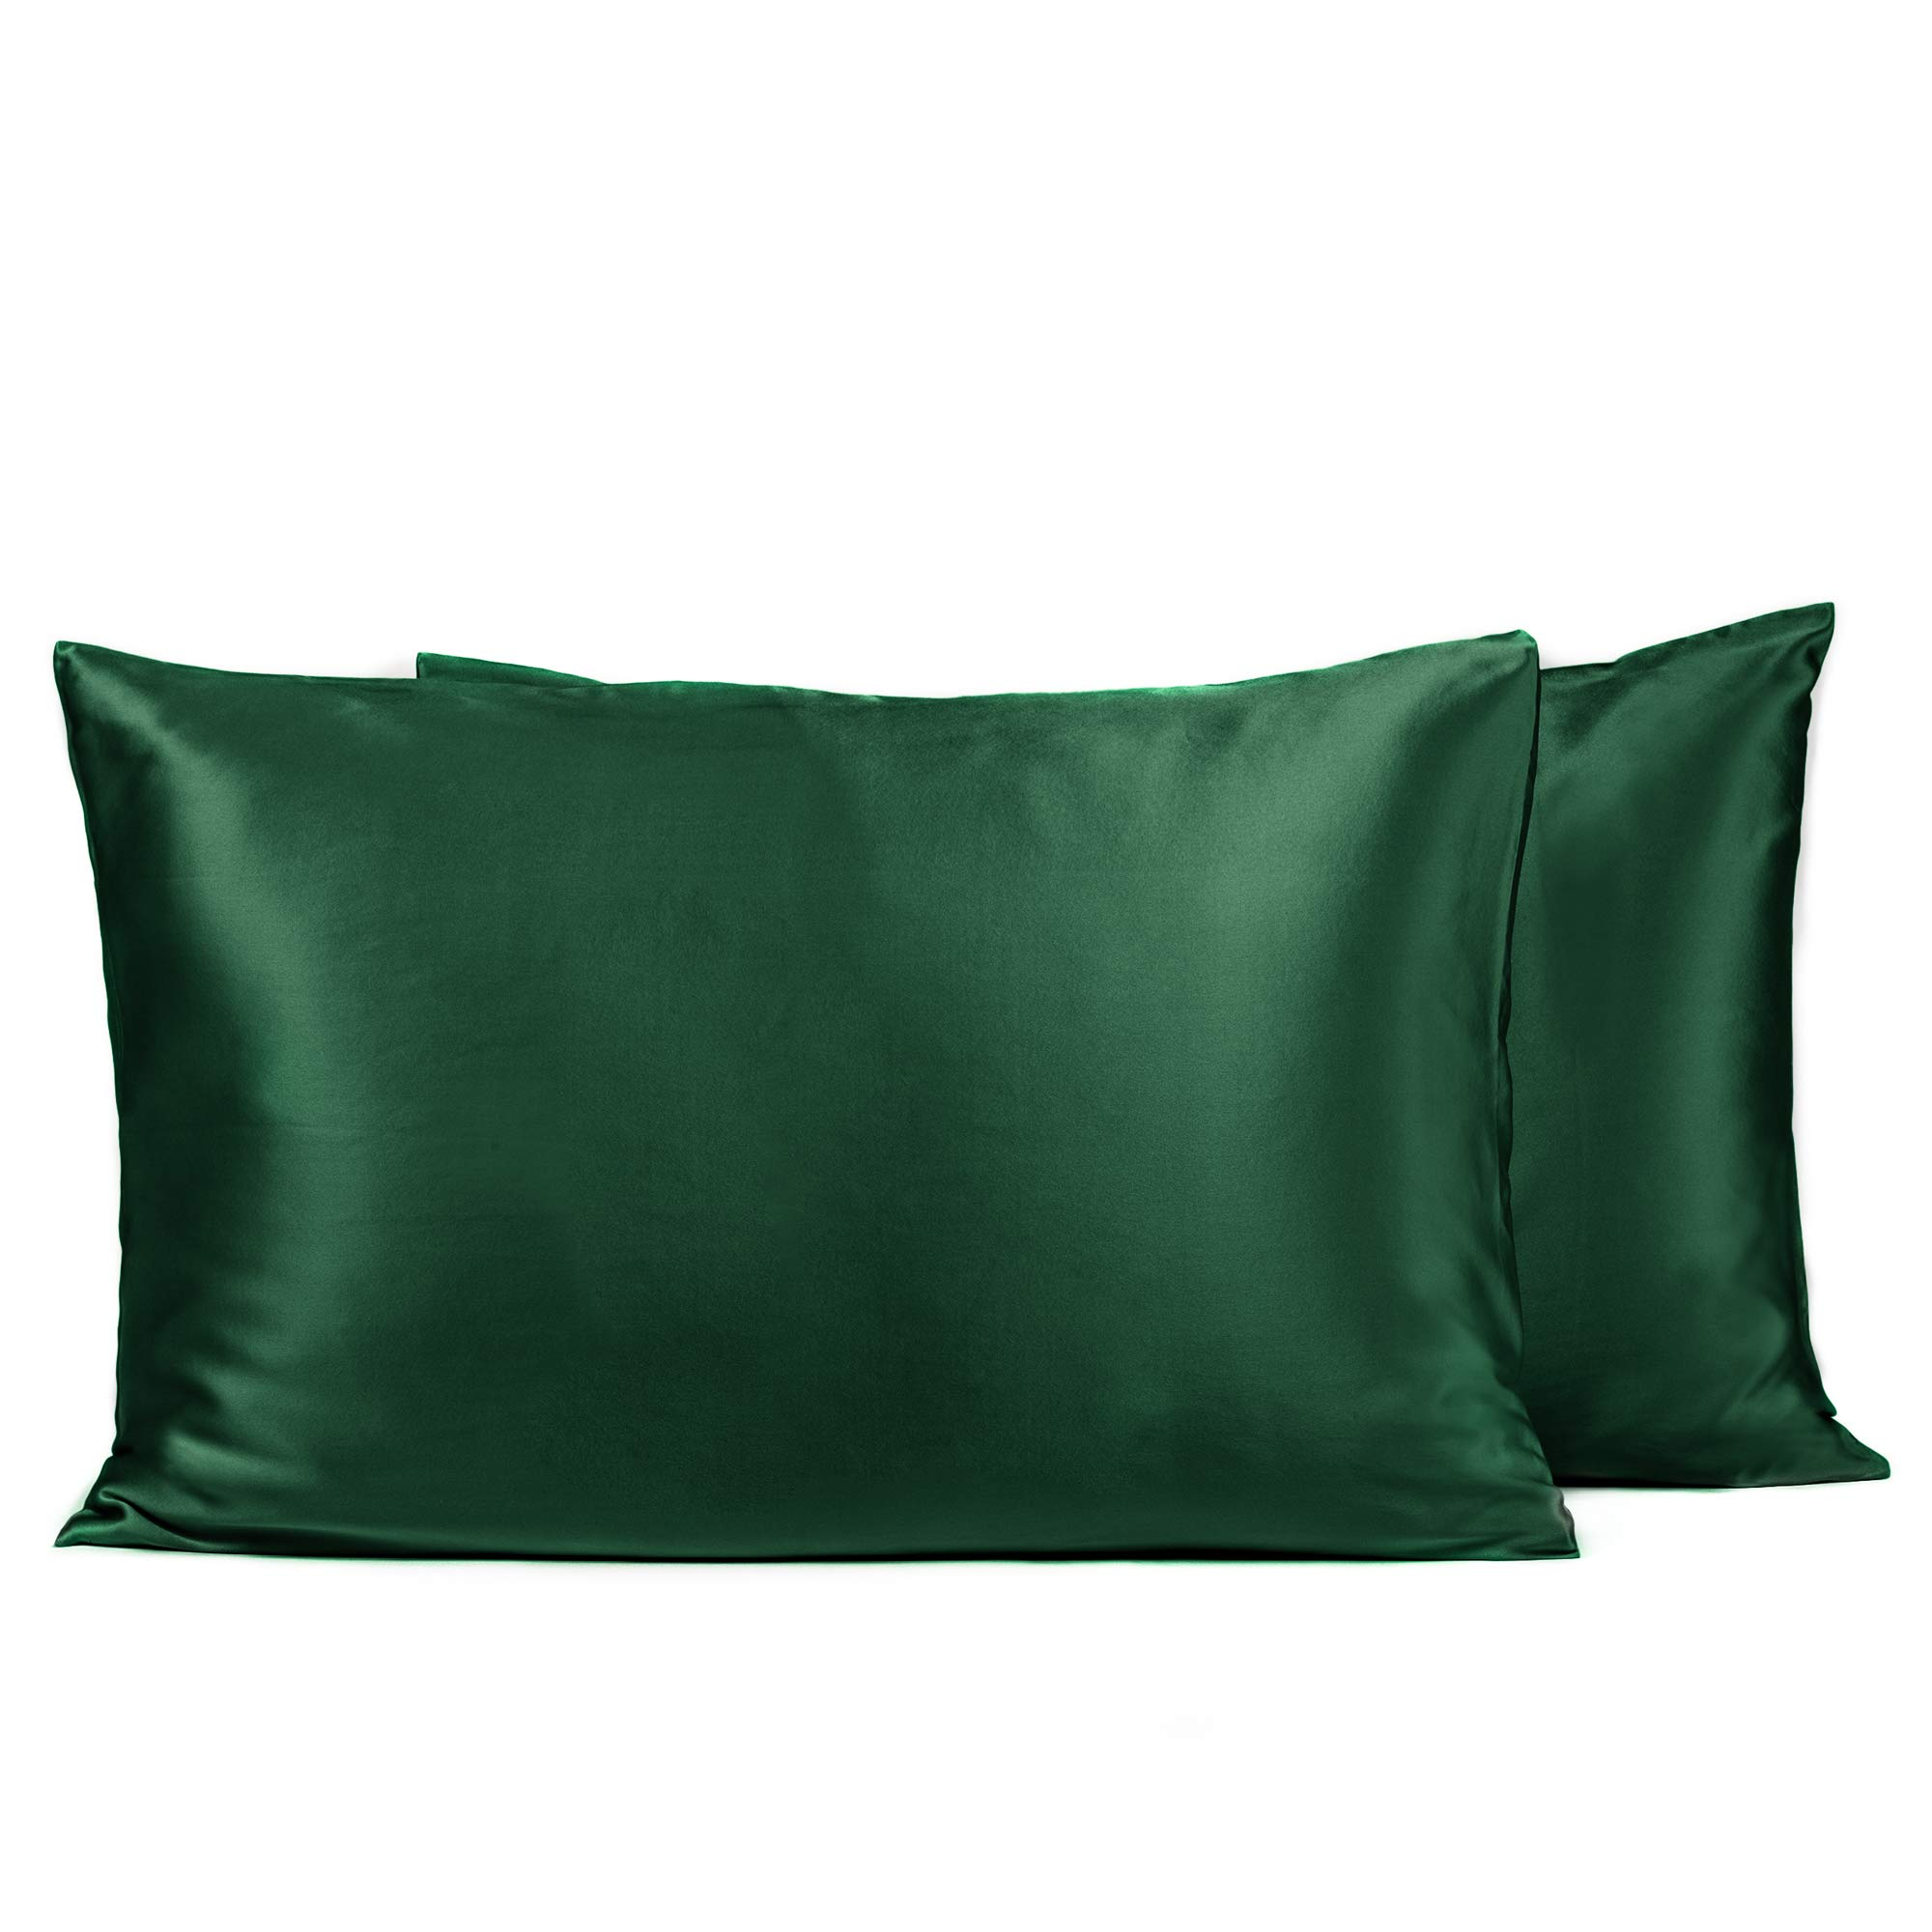 Fishers Finery 25mm 100% Pure Mulberry Silk Pillowcase, Good Housekeeping Winner (Dark Green, Queen 2 Pack)